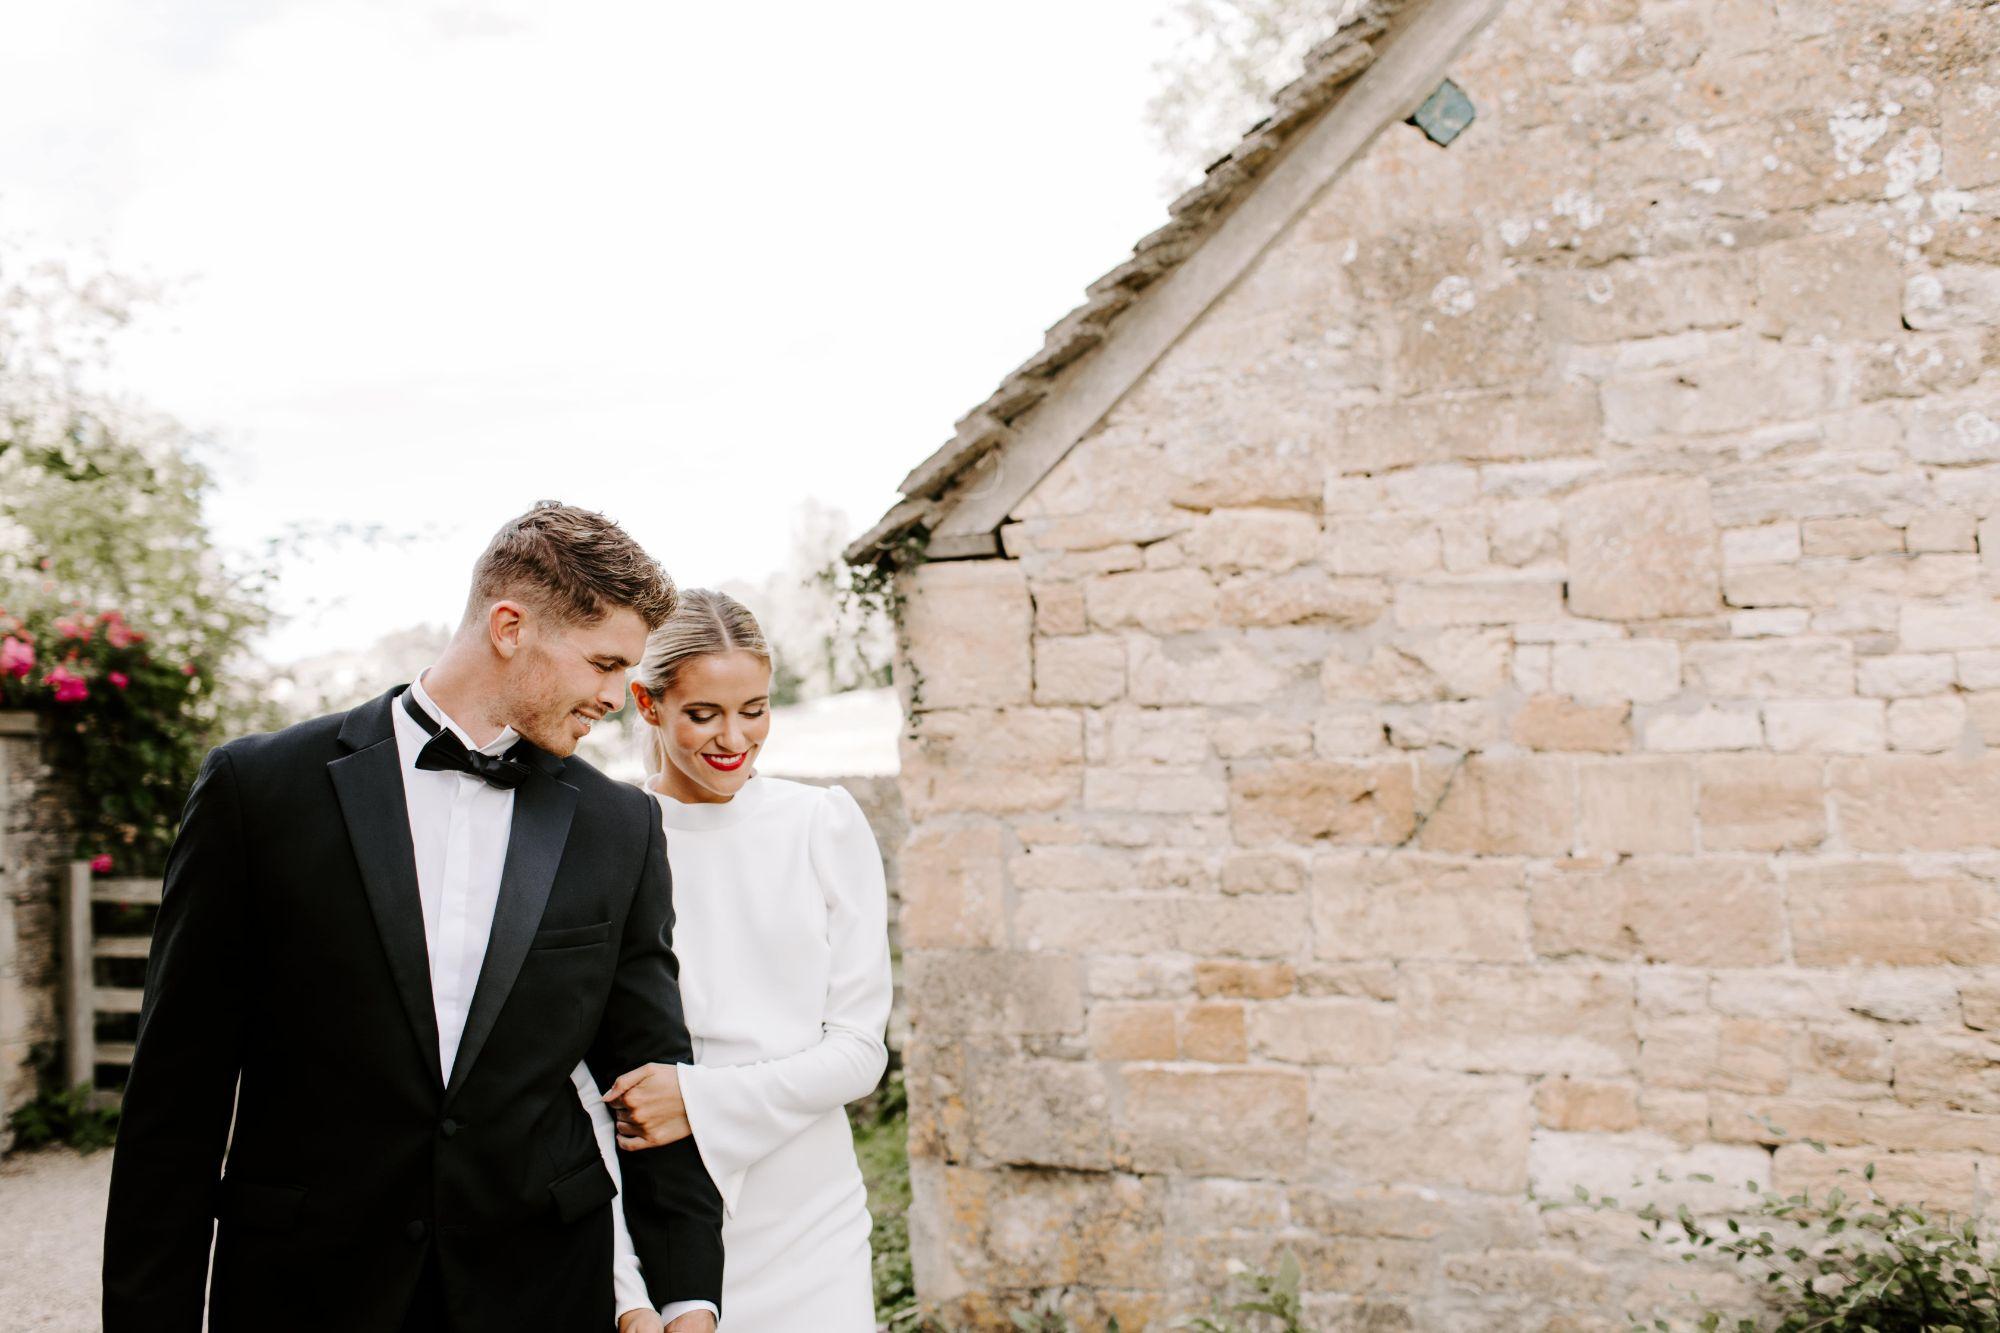 Wedding_Photography_Becky_Tranter-116-min